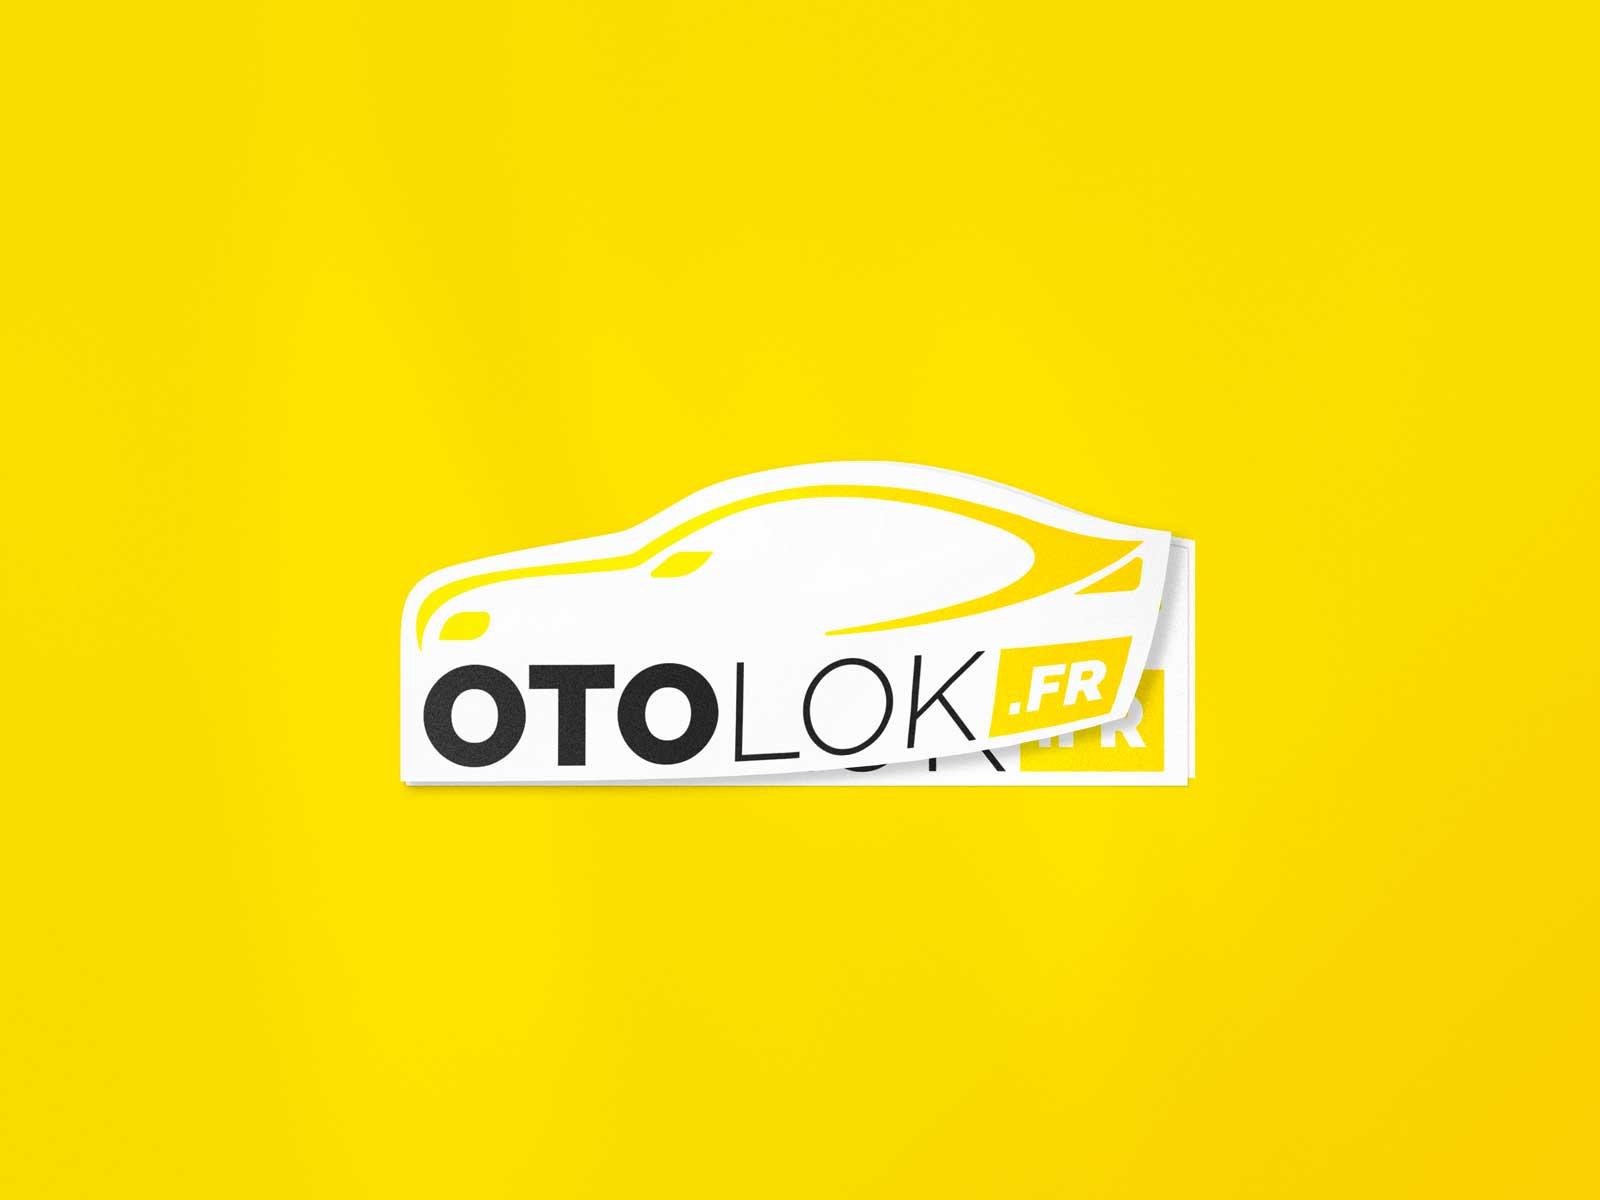 Sticker Otolok